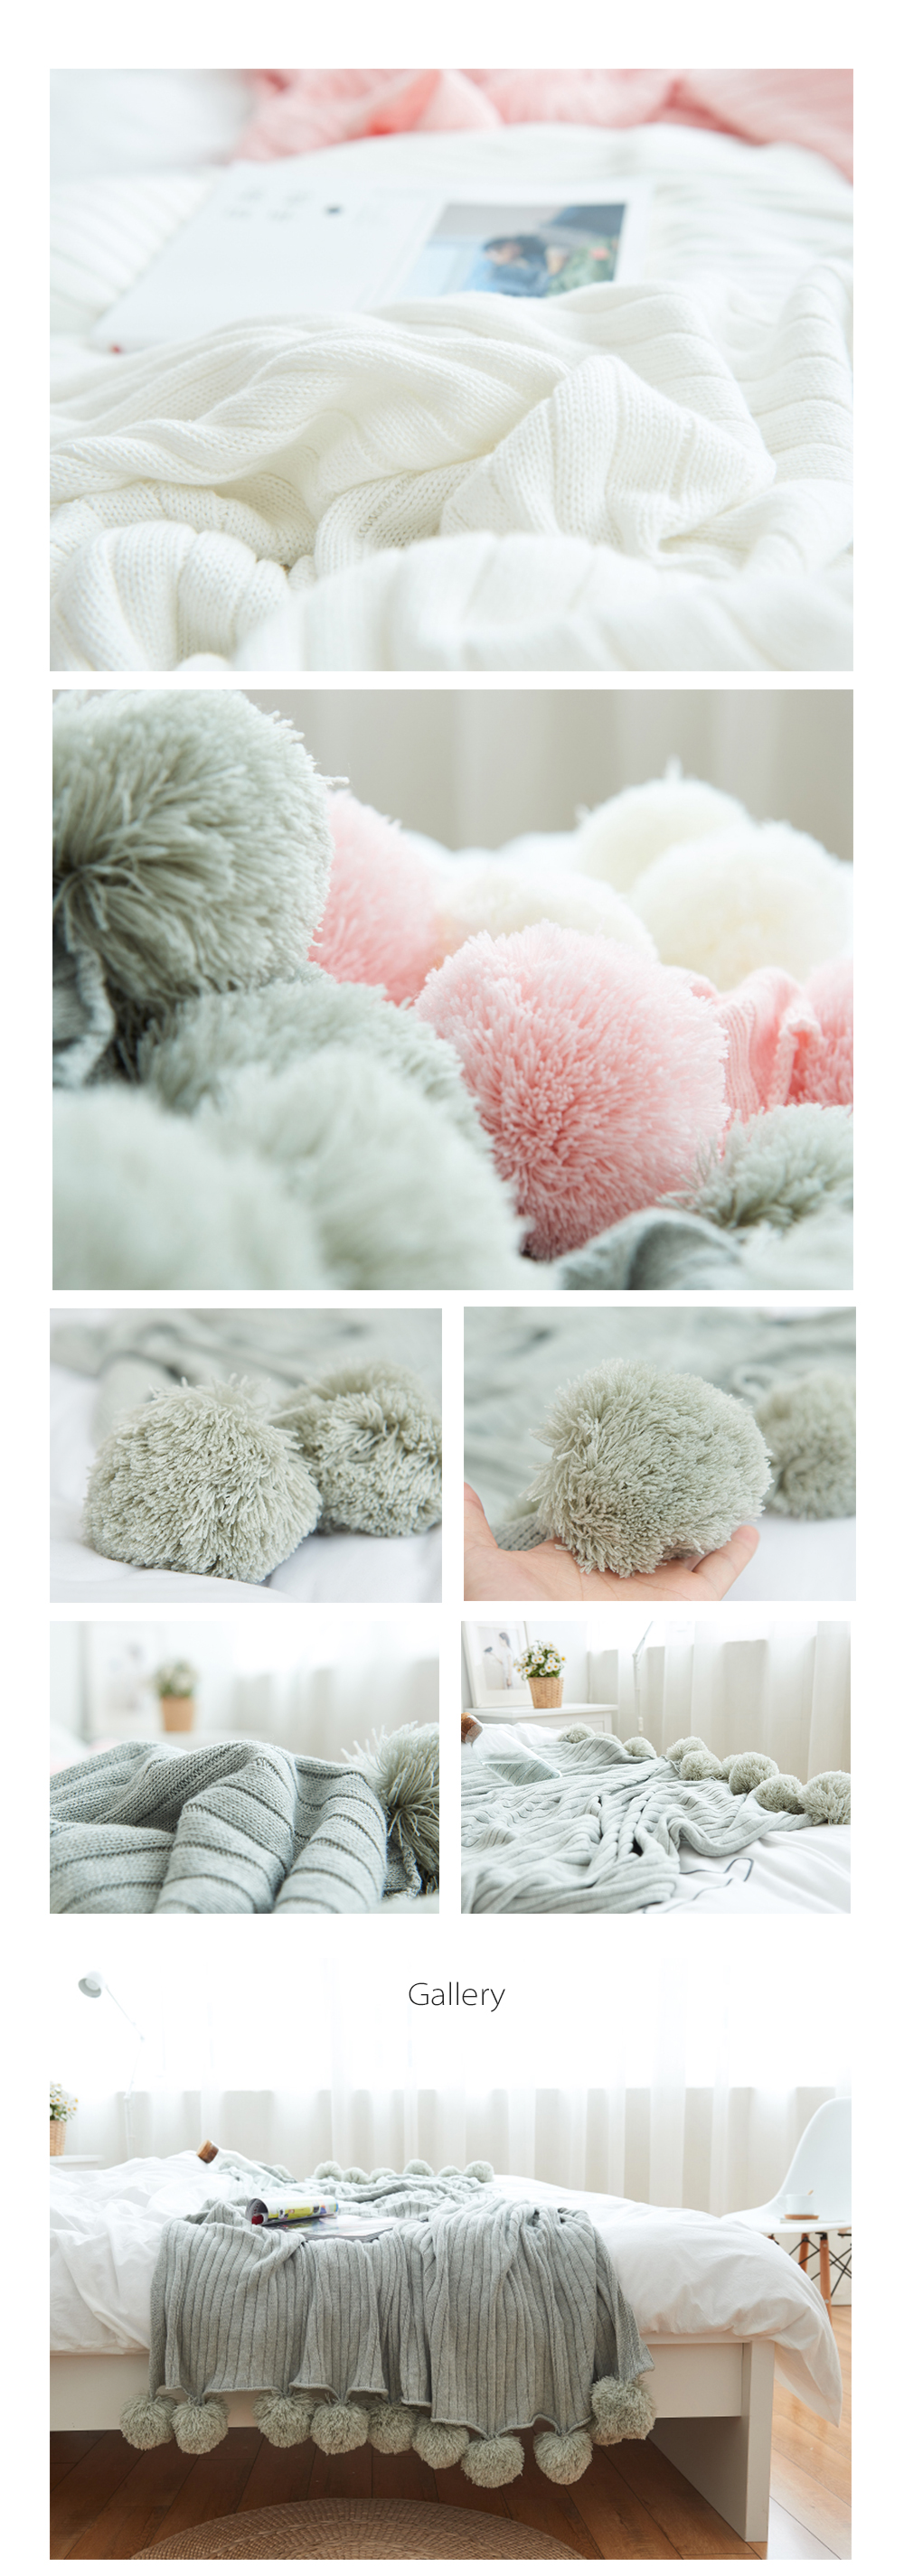 Pom Pom Throw Blanket Made of Cotton